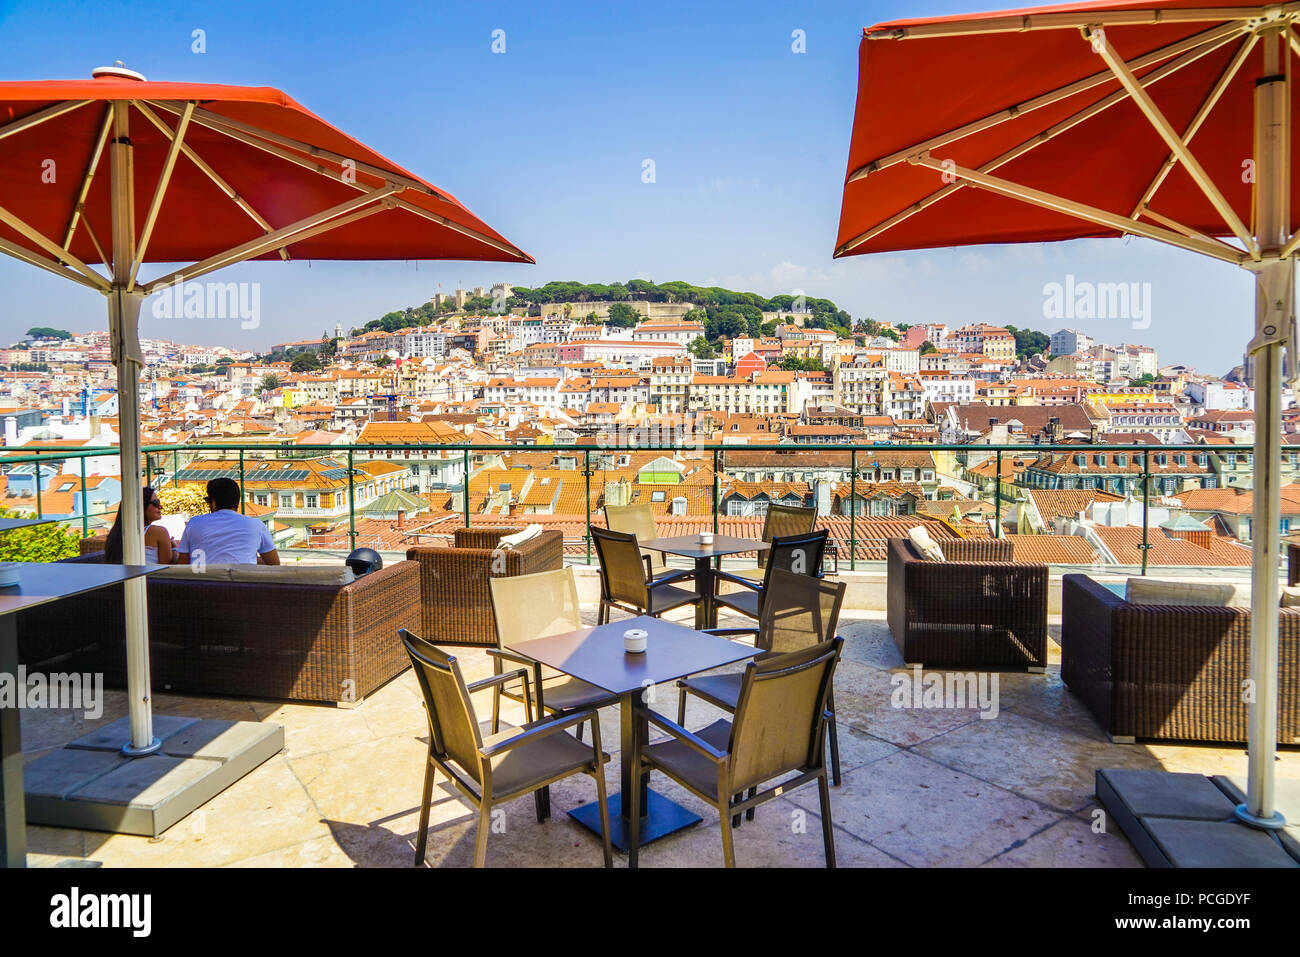 Lisbona. Immagini Stock